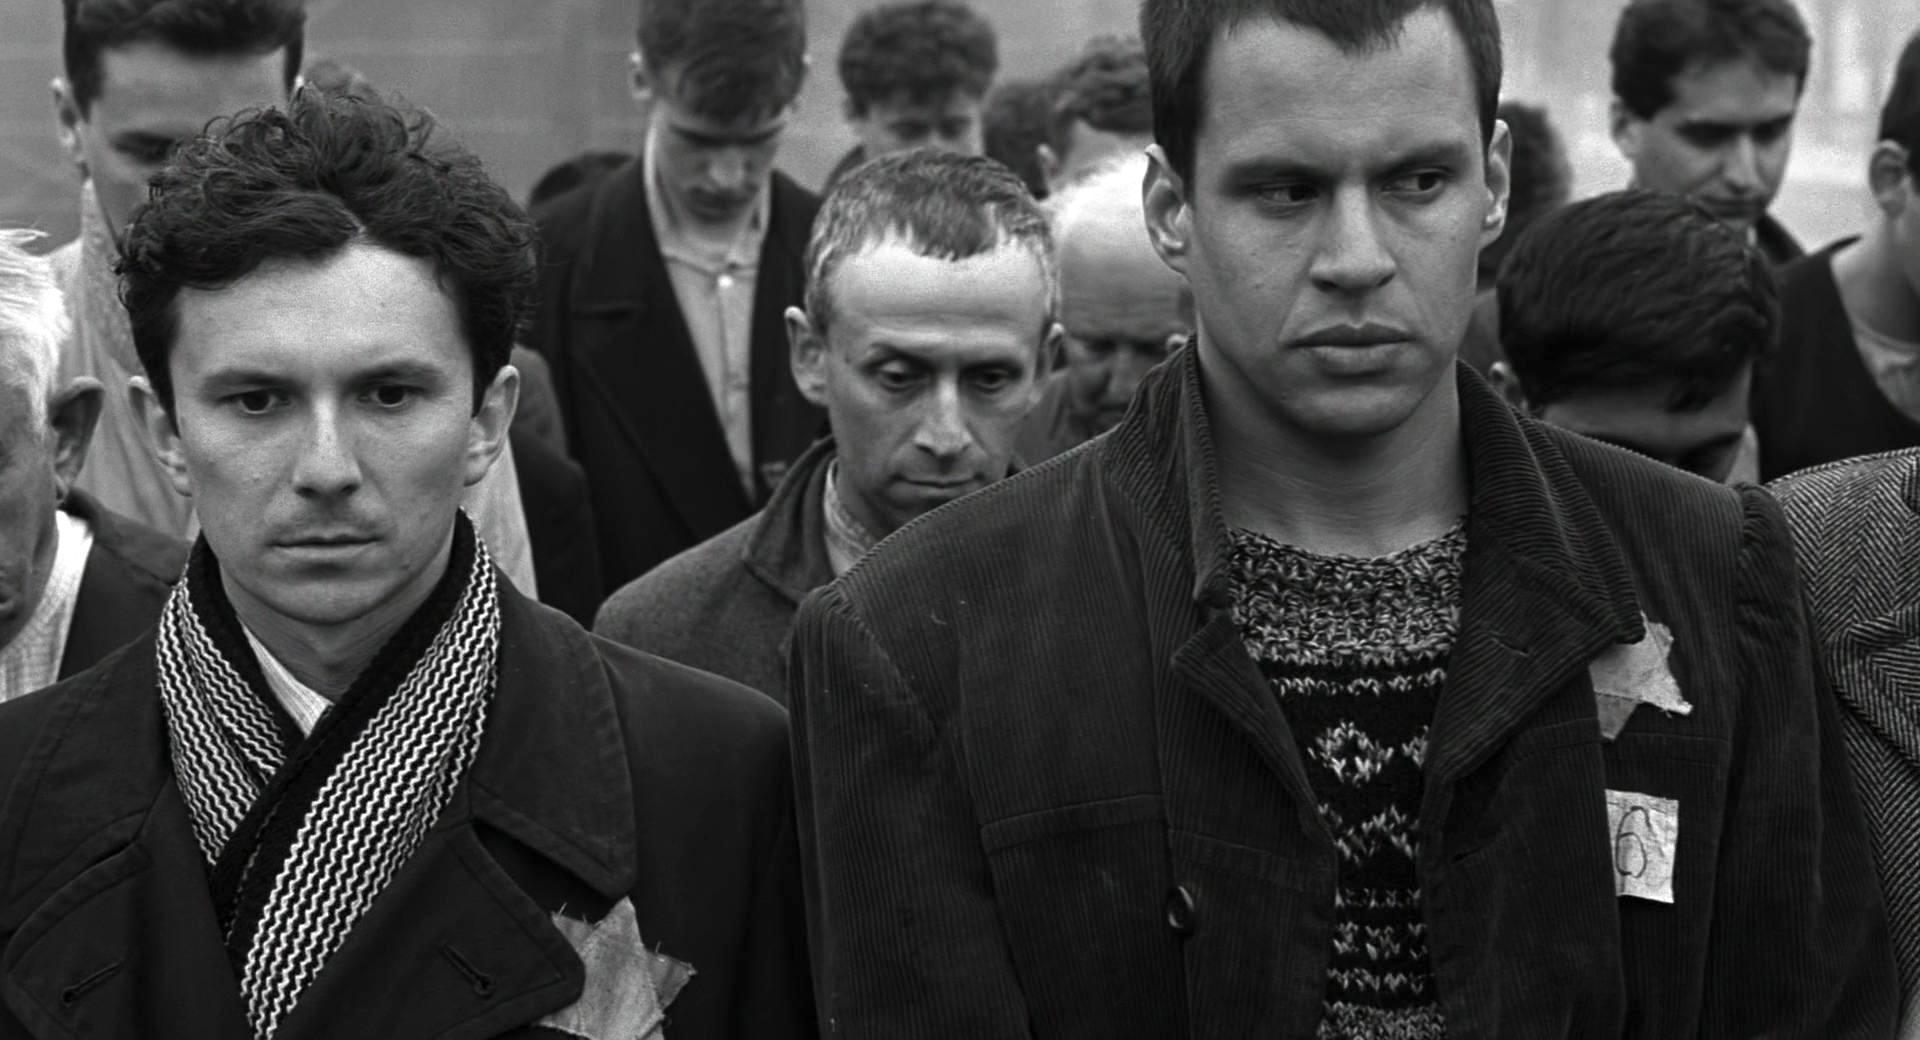 Jonathan Sagall and Jacek Wójcicki in Schindler's List (1993)